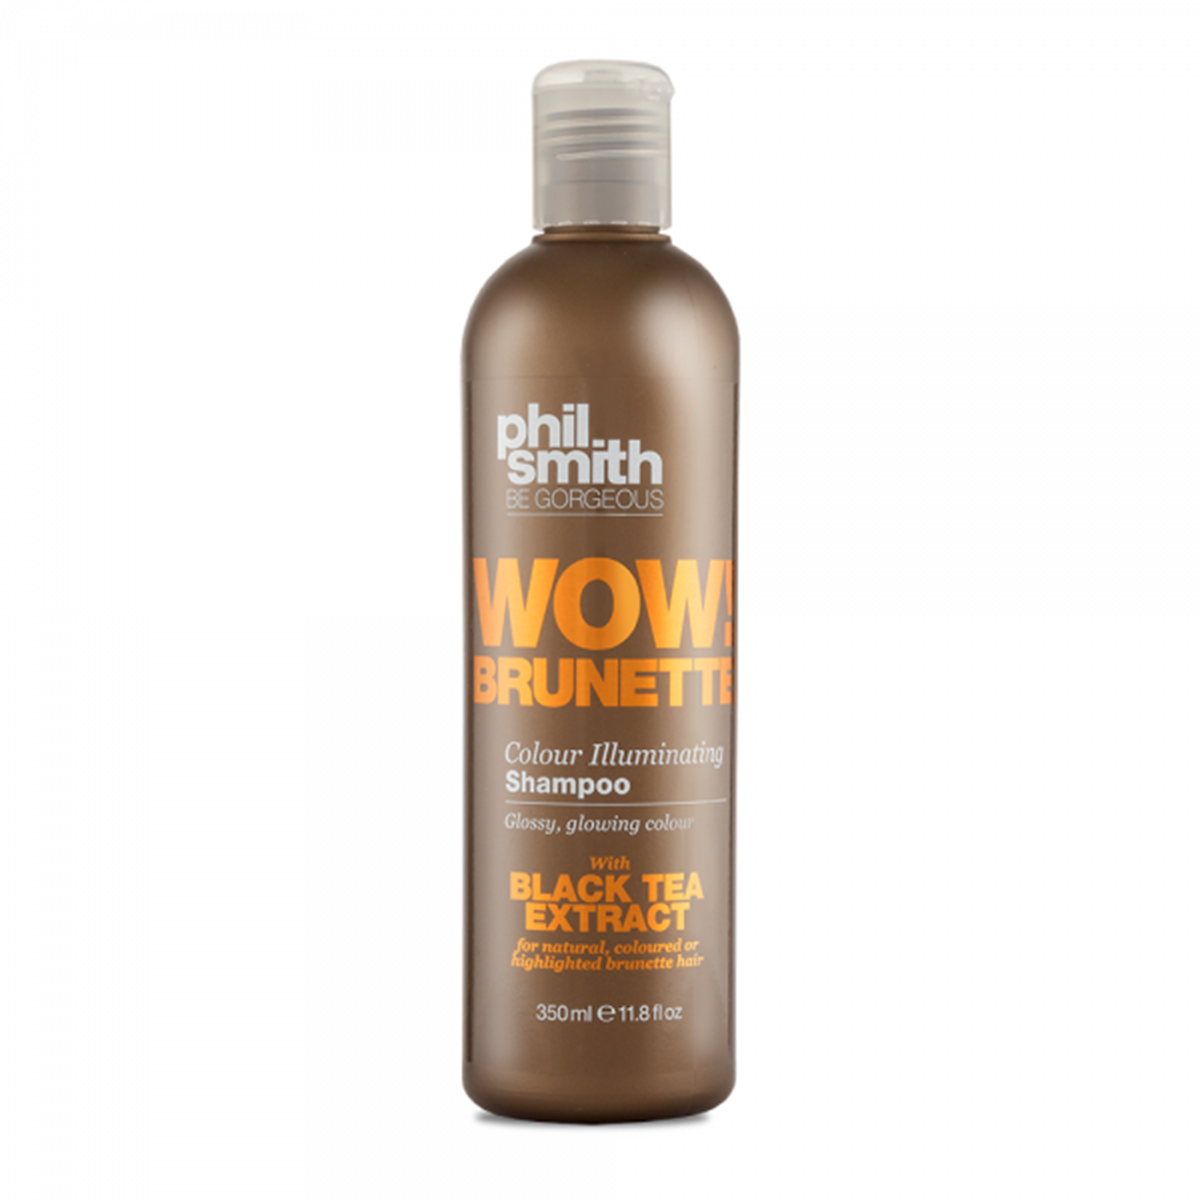 Phil Smith Wow Brunette Şampuan 350 ml